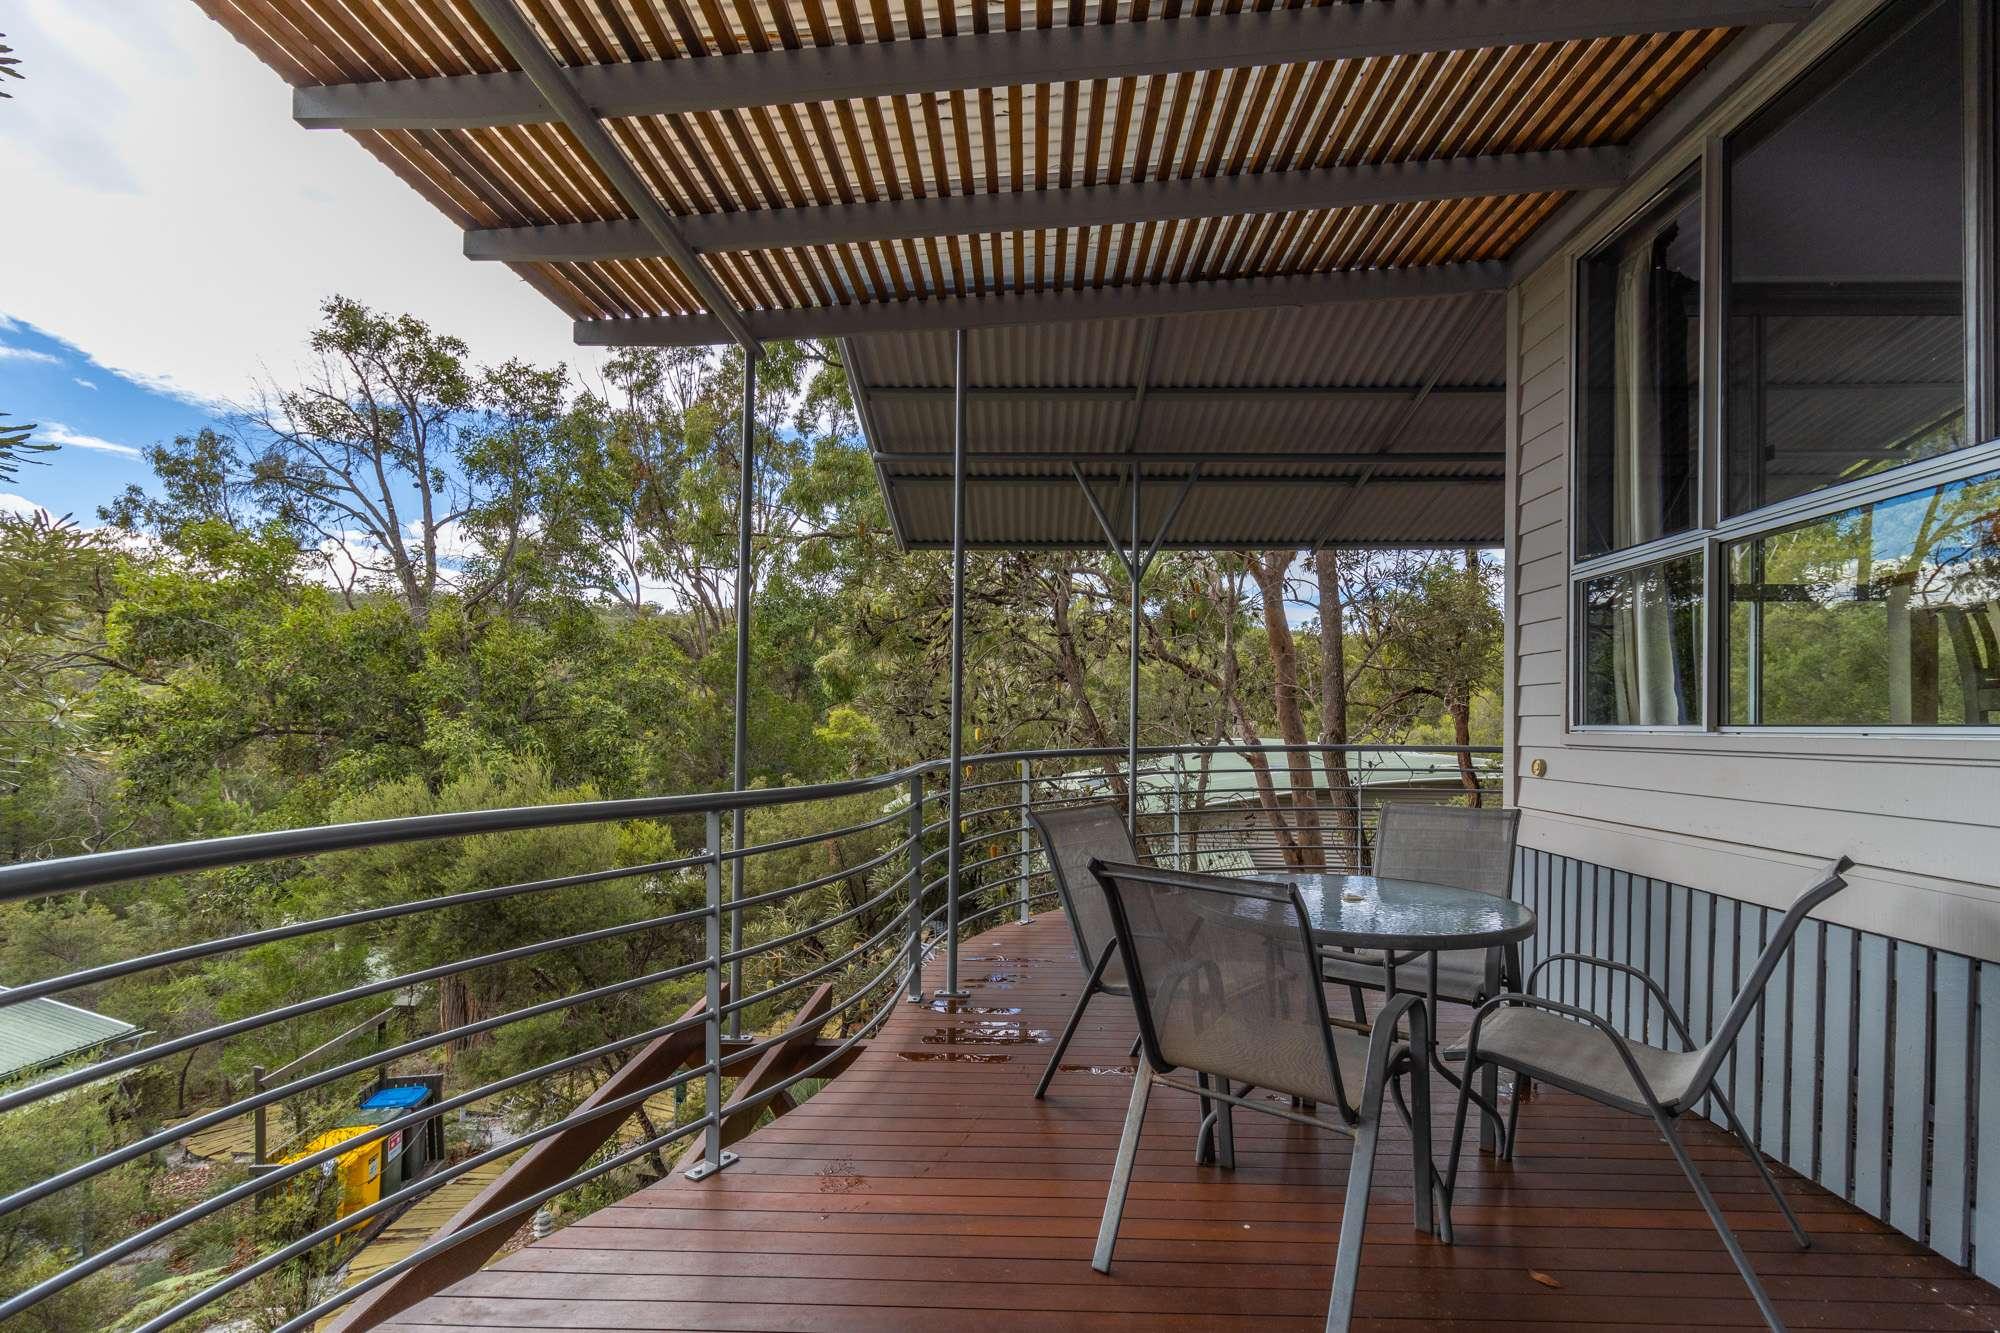 636 Satinay Villa Kingfisher Bay, Fraser Island, QLD 4581